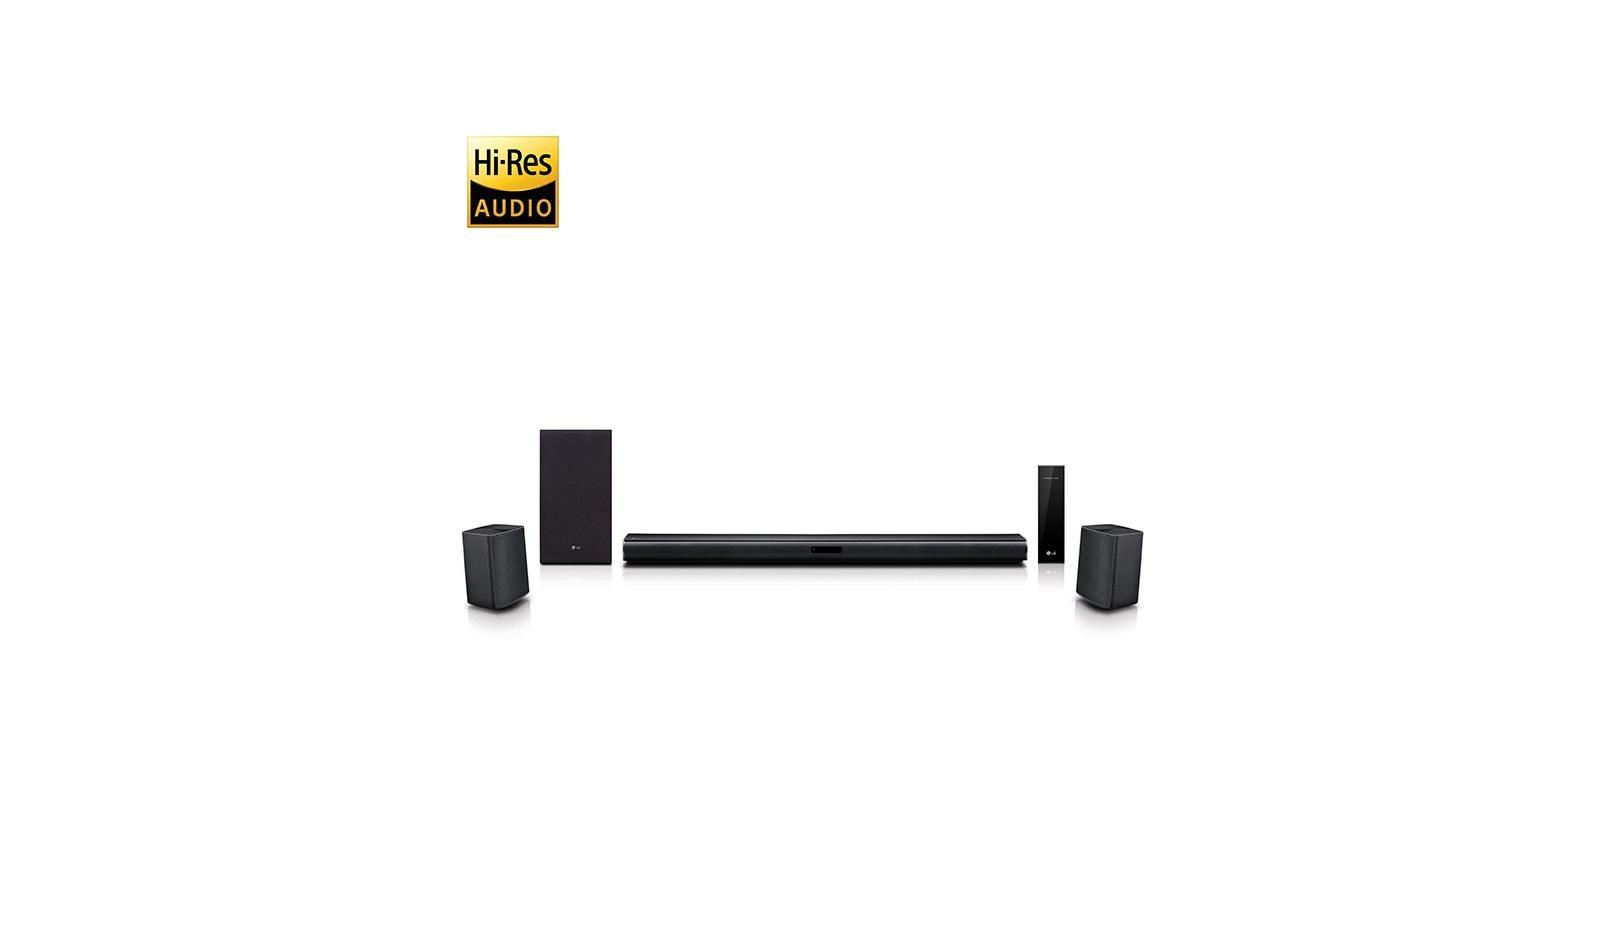 LG LASC58R: 4.1 Ch Sound Bar Surround System With Wireless Surround Sound  Speakers   LG USA